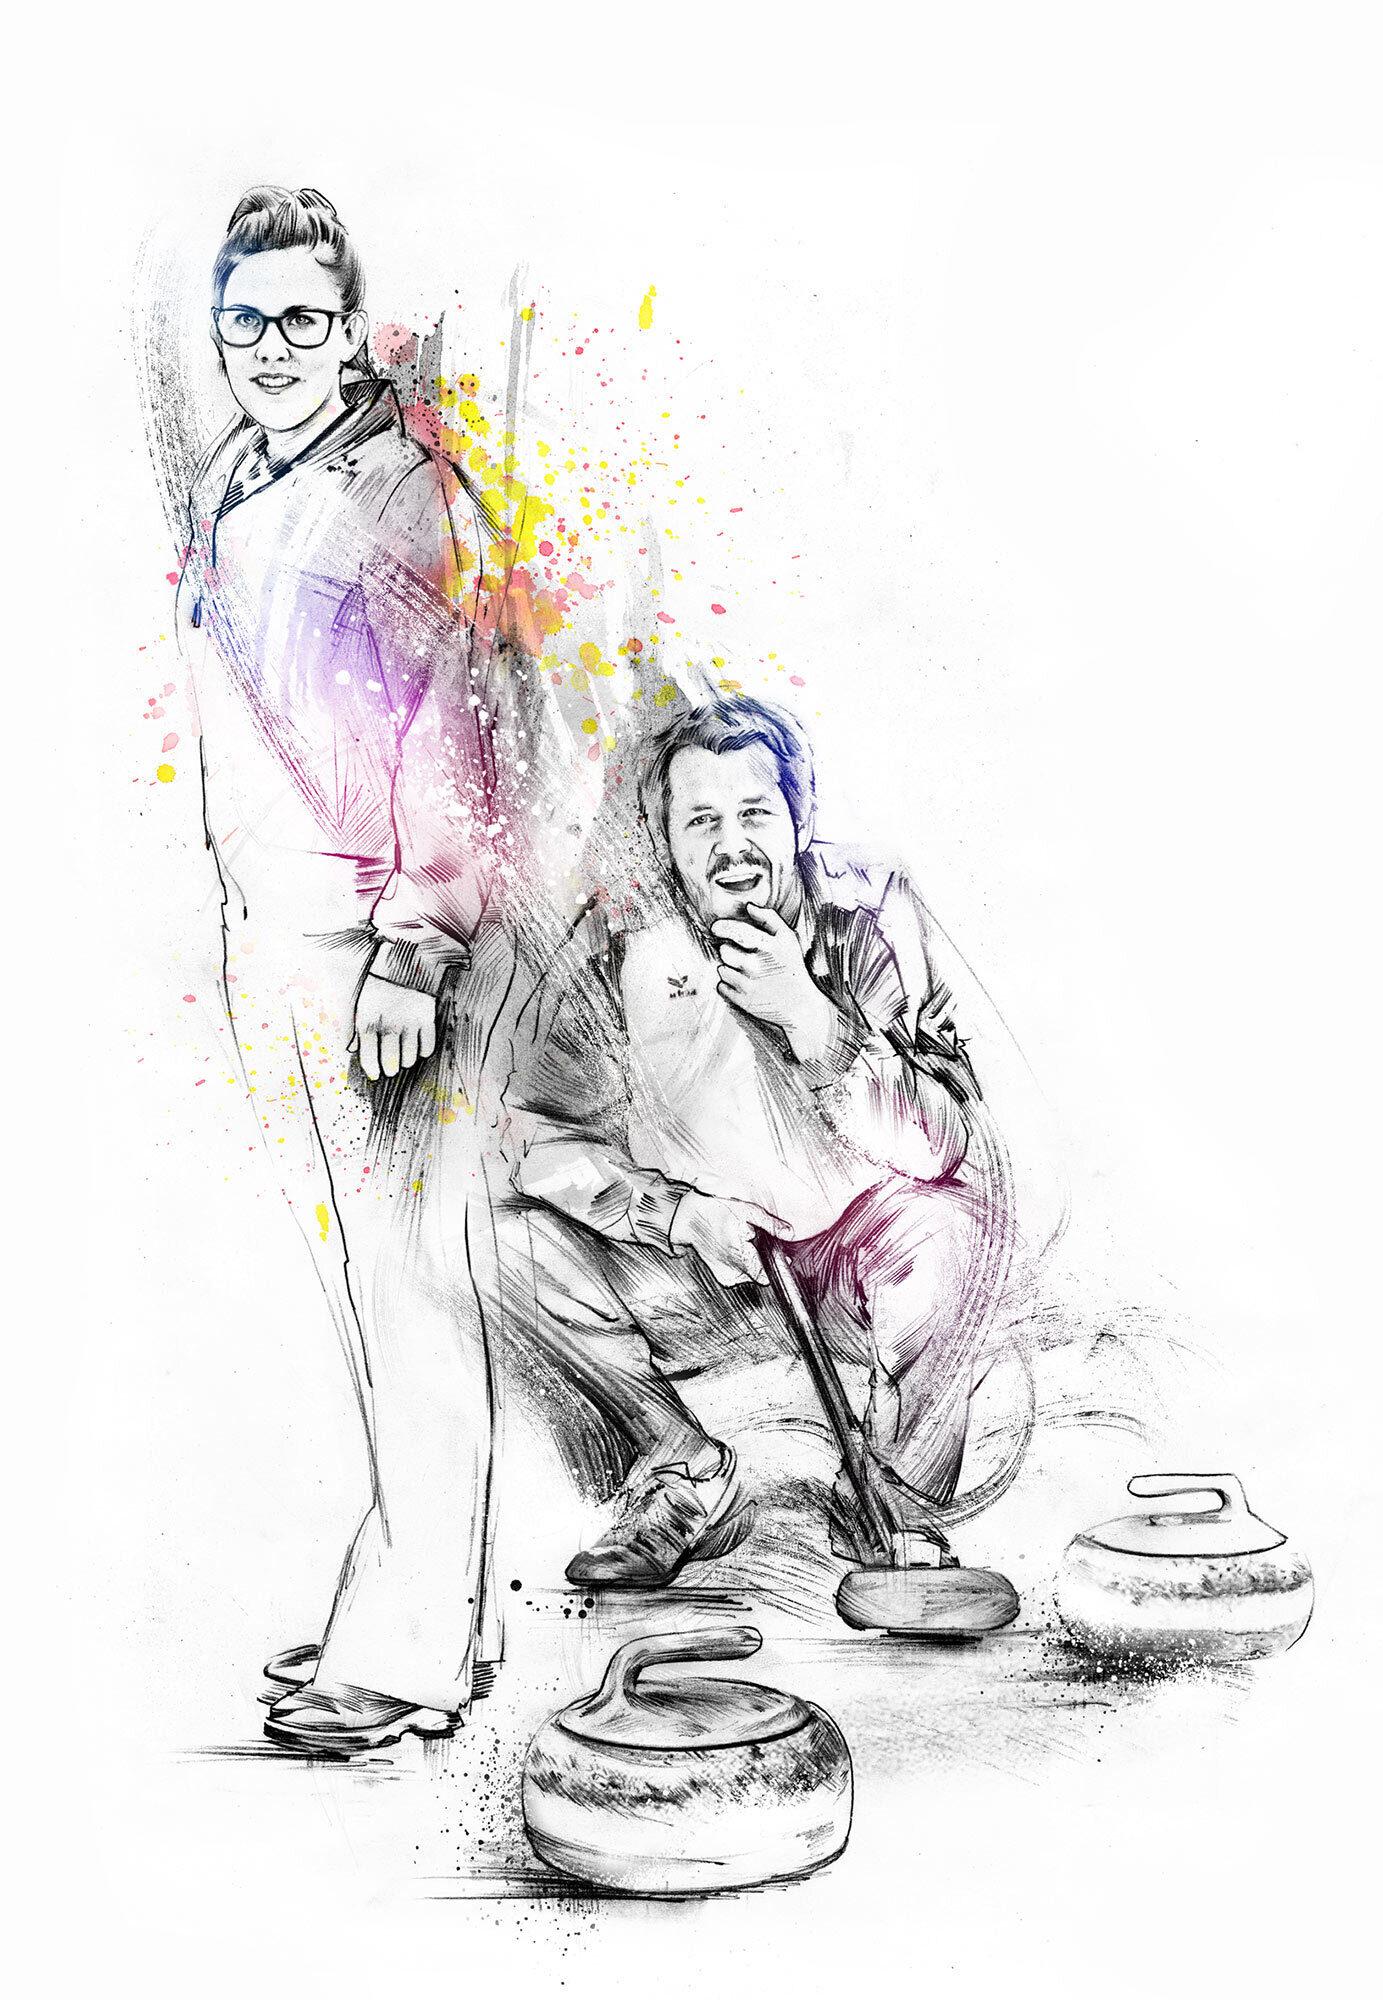 Curling - Kornel Illustration   Kornel Stadler portfolio